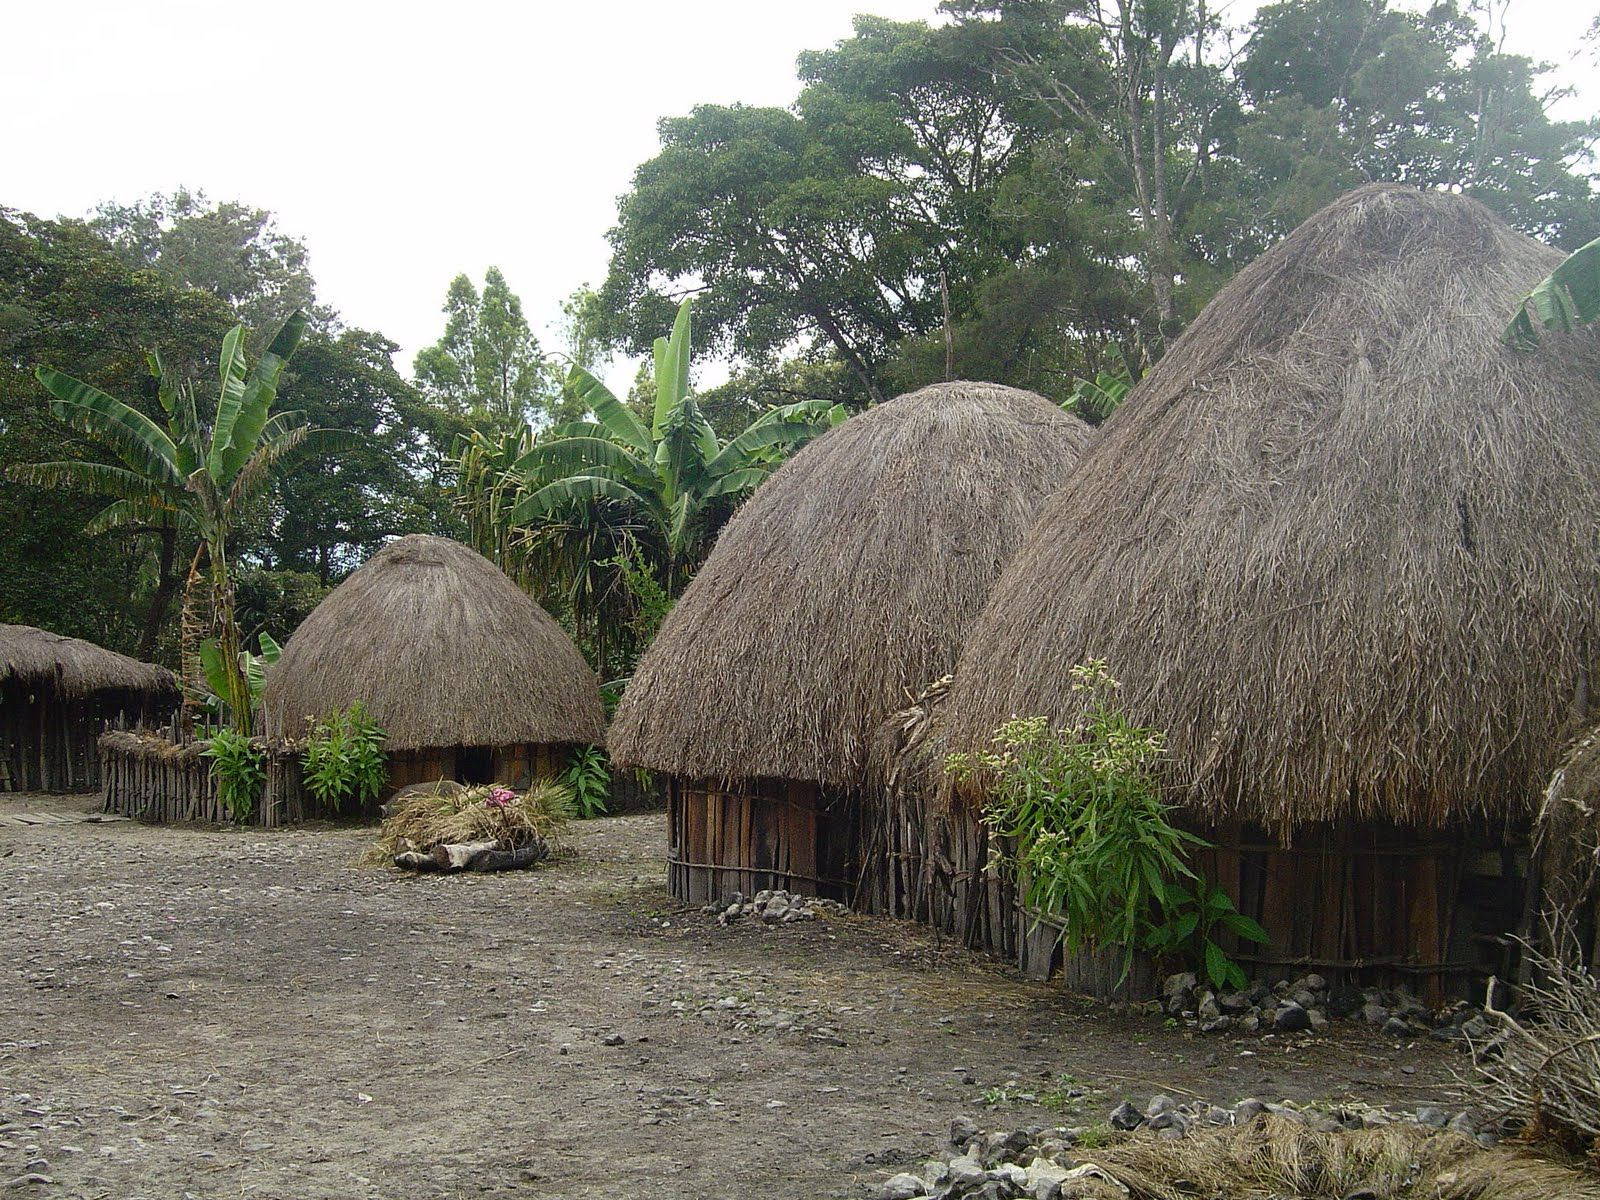 Atap Rumah Adat Mbaru Niang Terbuat Dari